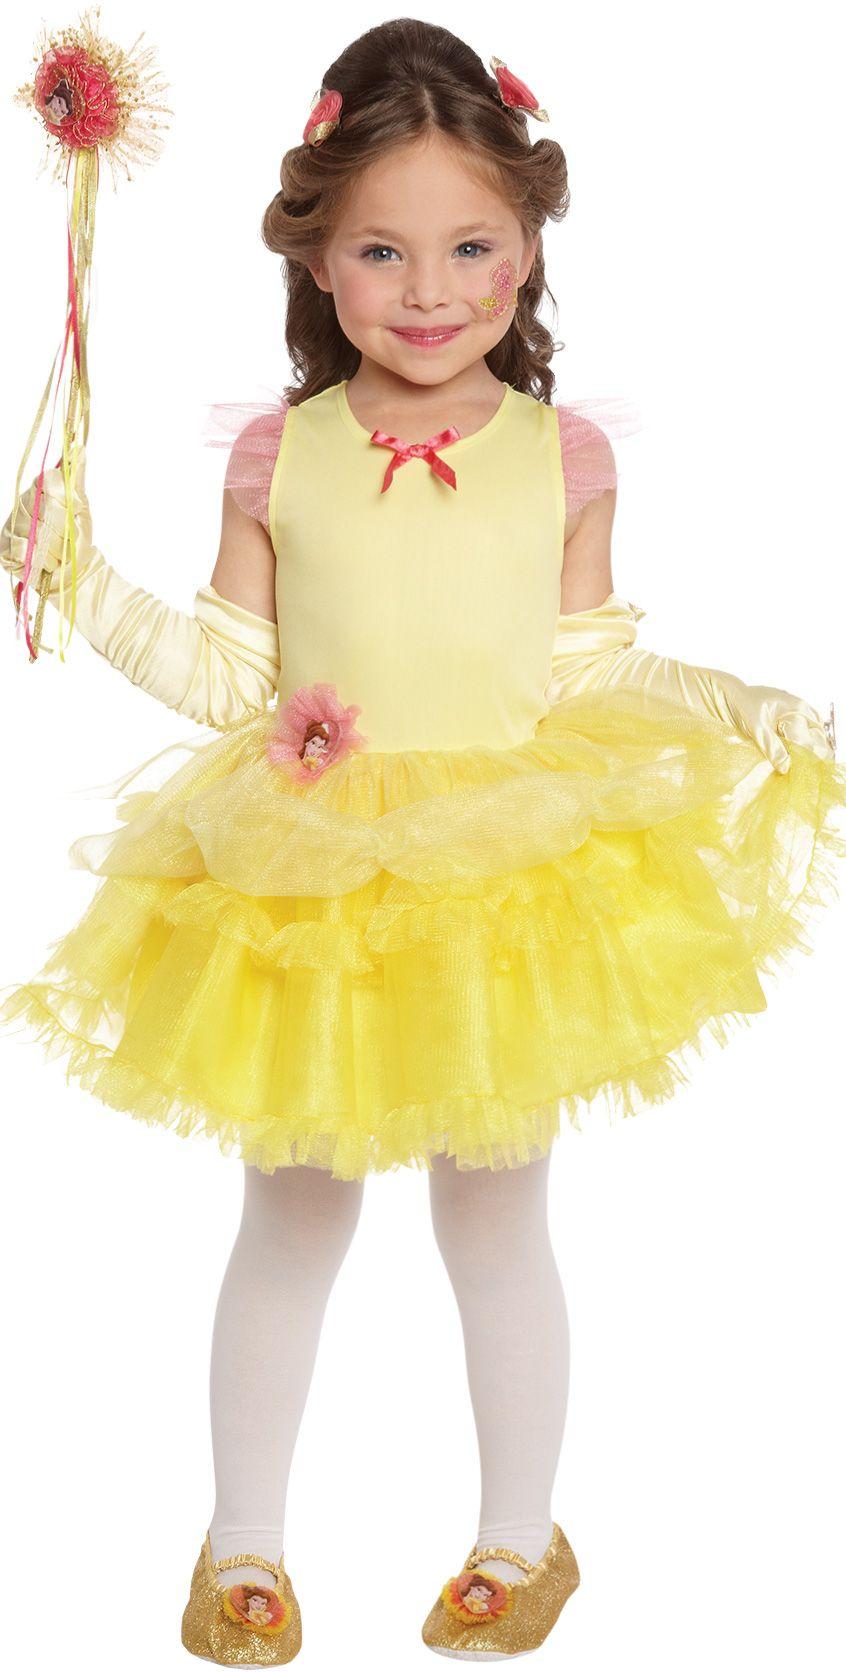 Create Your Look - Girl Belle Disney Princess